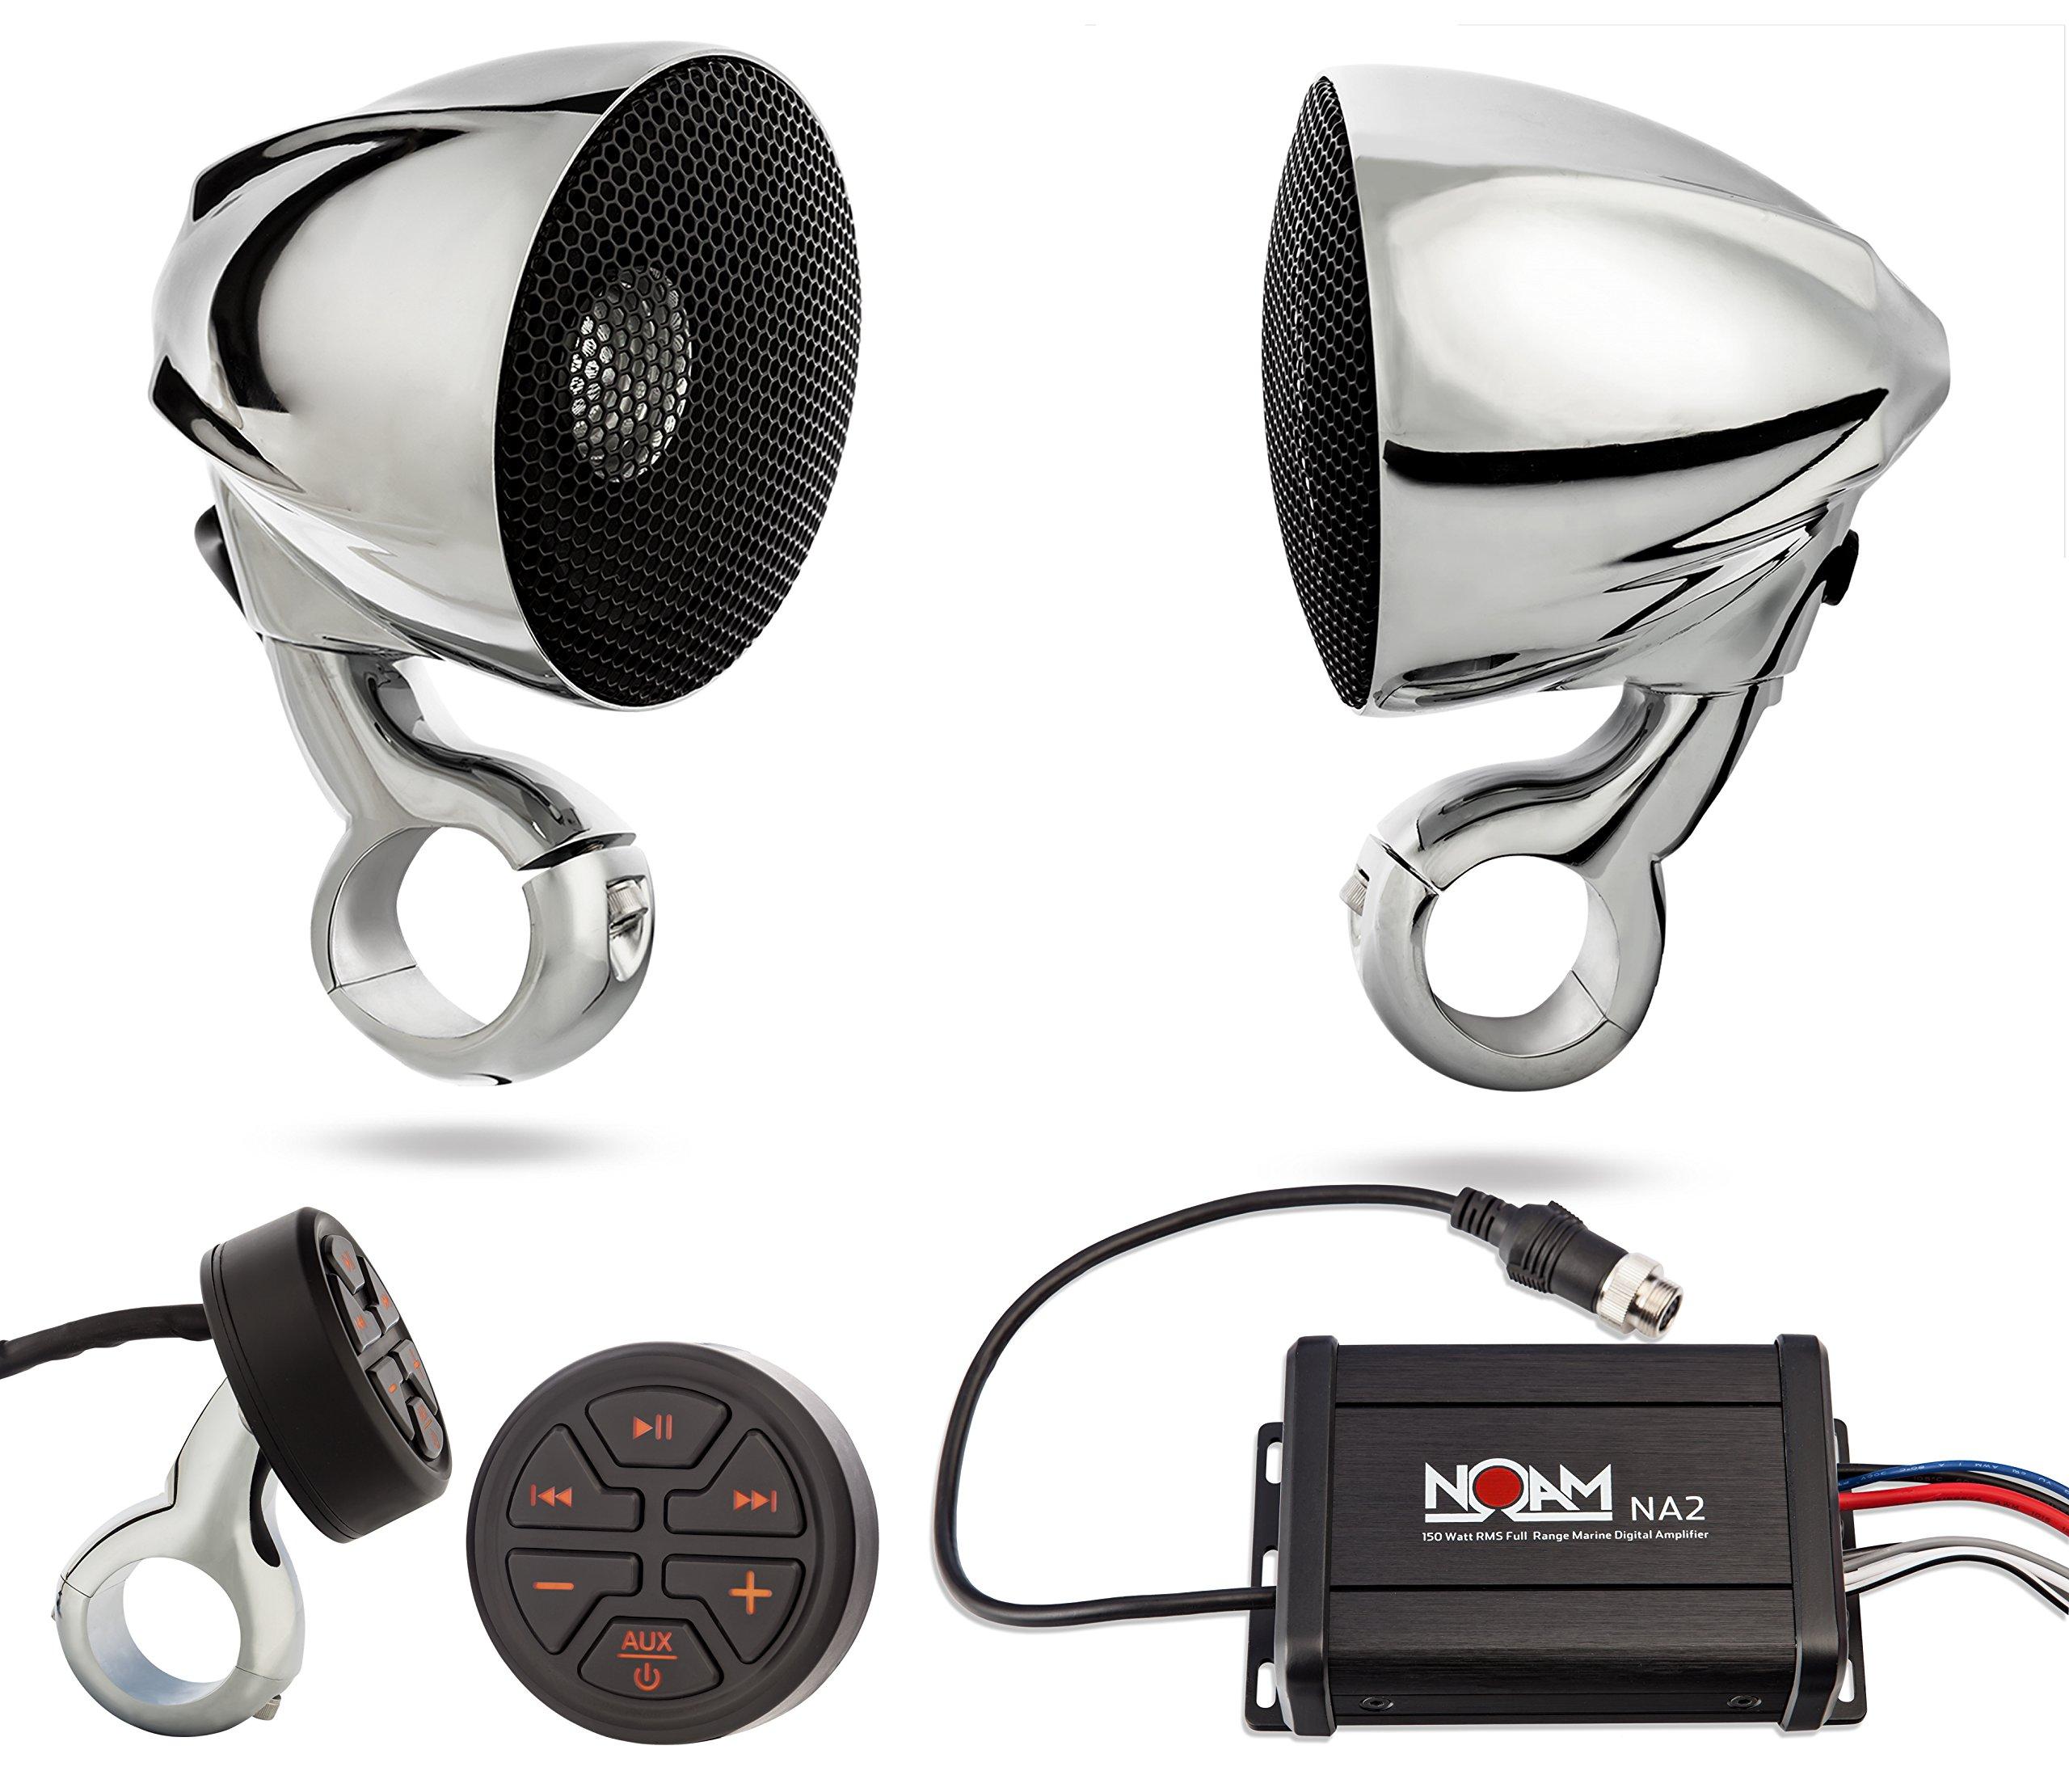 NOAM NMC3 - Waterproof Motorcycle / ATV Chrome Speakers Bluetooth Stereo System